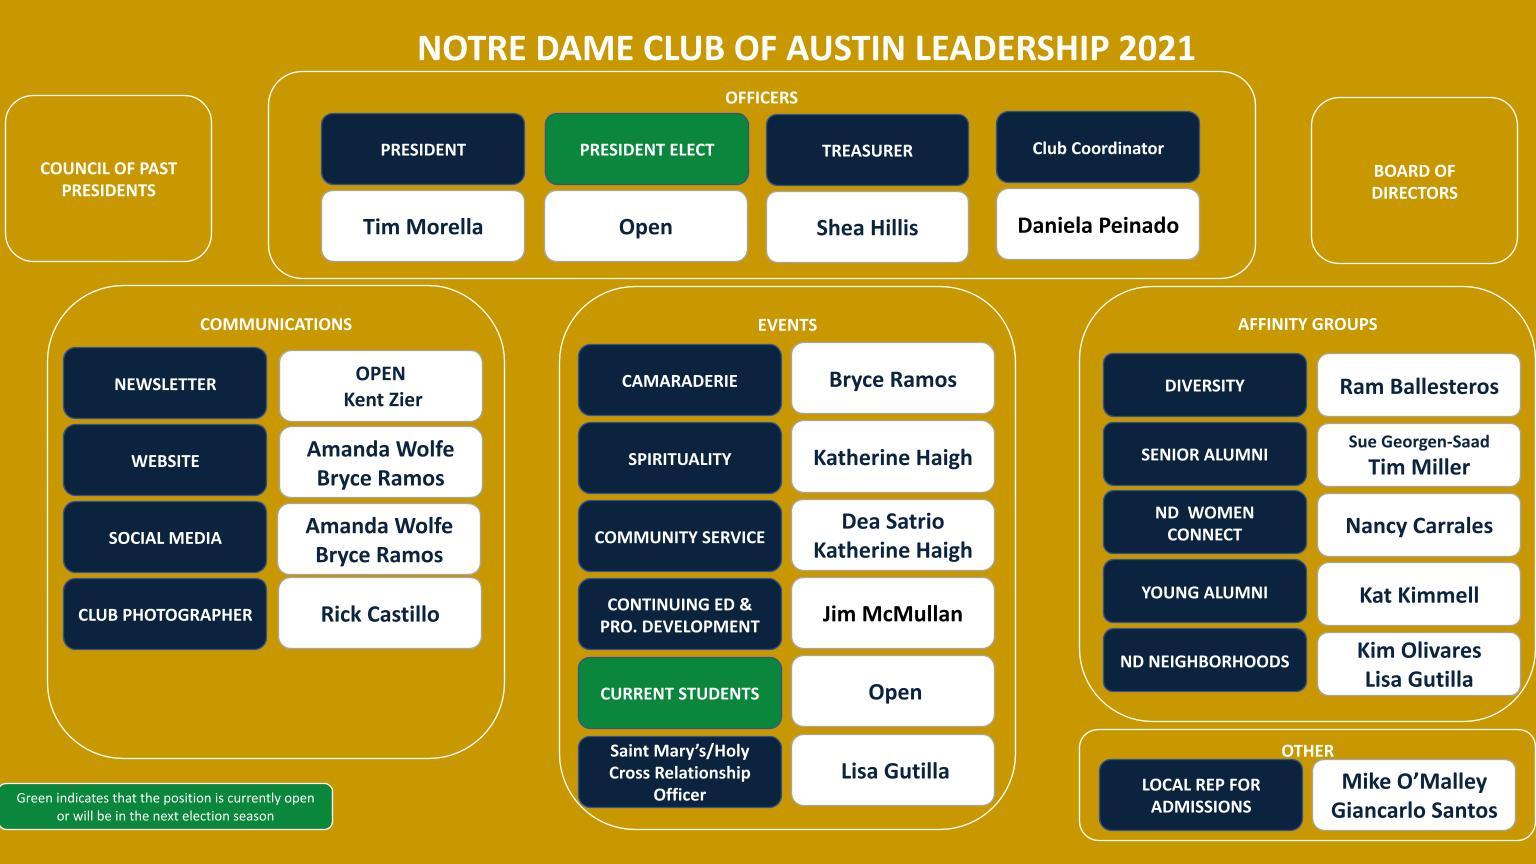 Notre Dame Club of Austin Leadership Chart 2021 V6